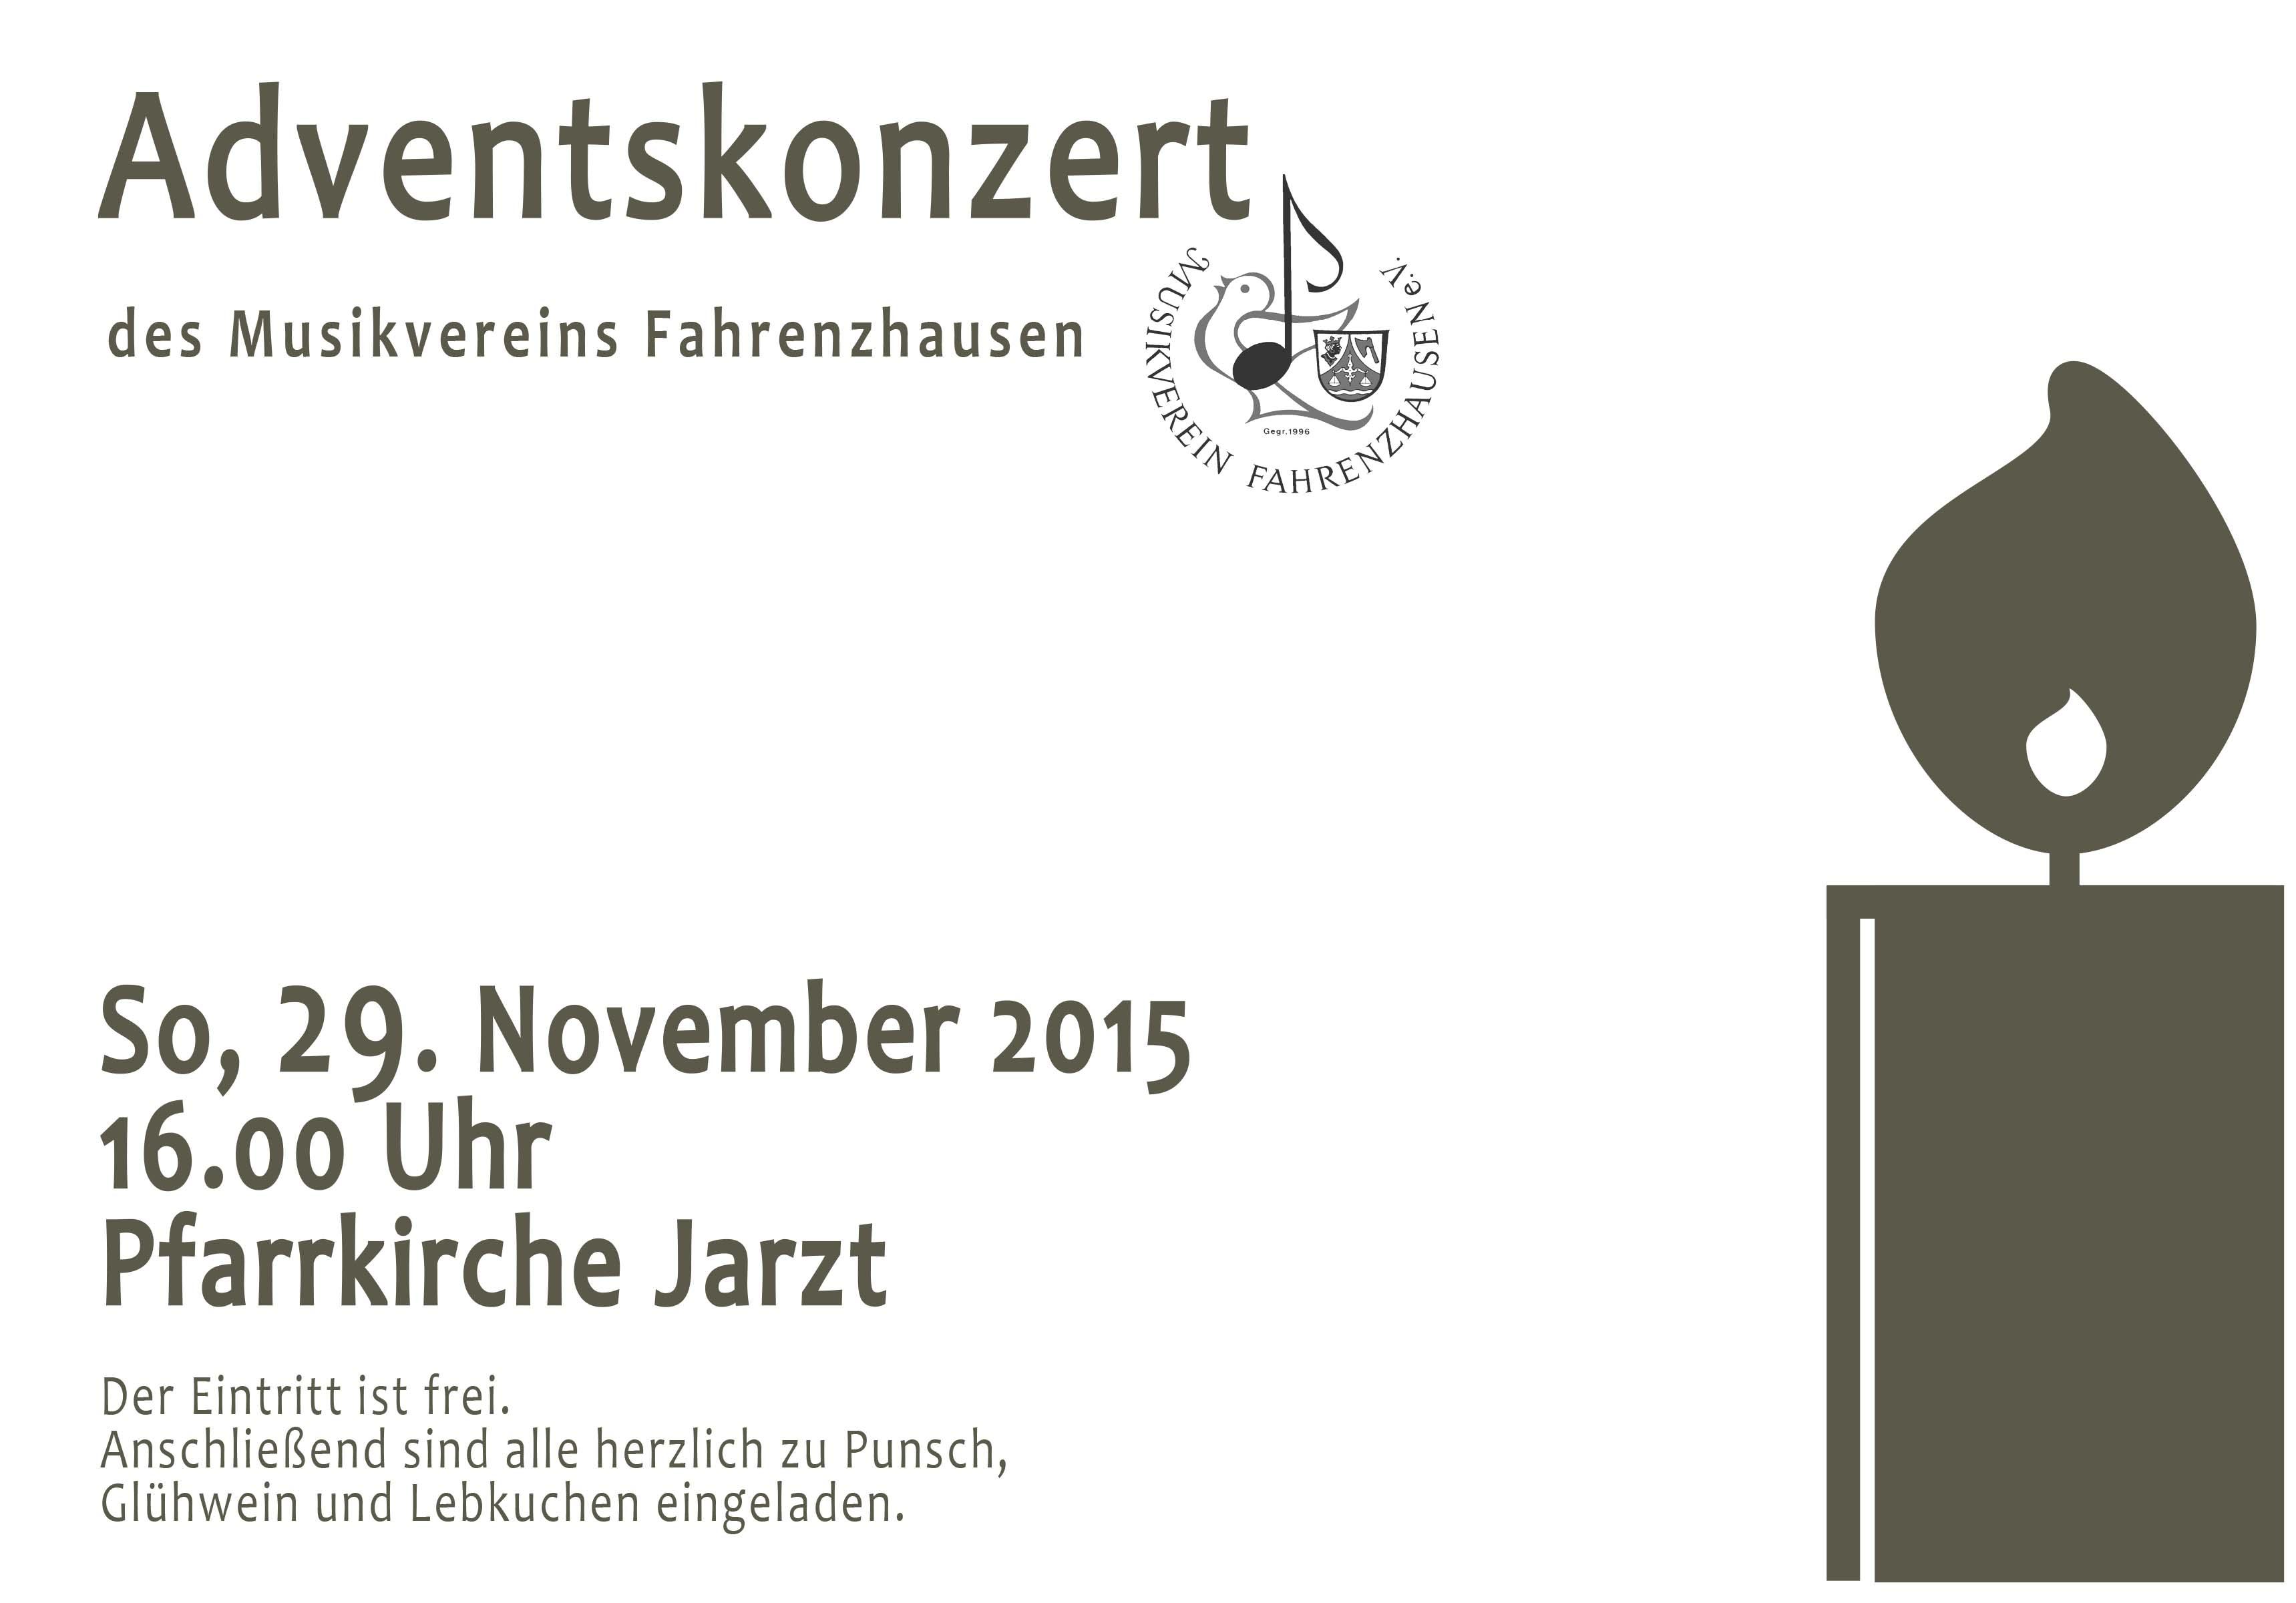 2015-11 Plakat Adventskonzert